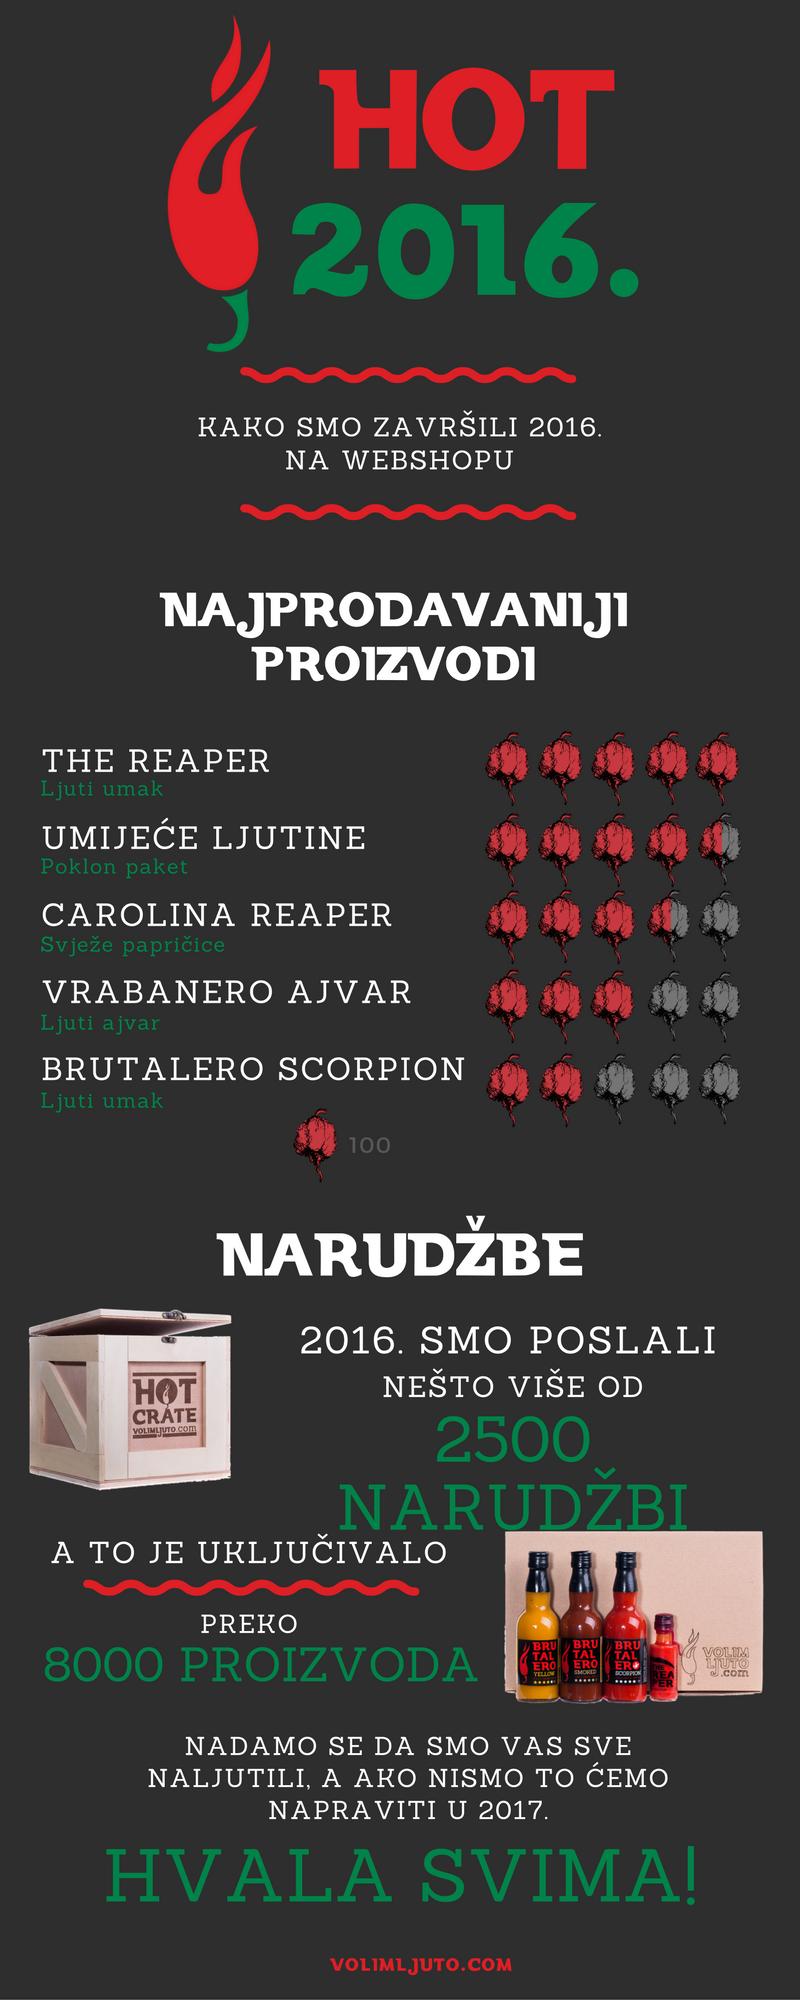 Ljuti presjek 2016. - Webshop 1